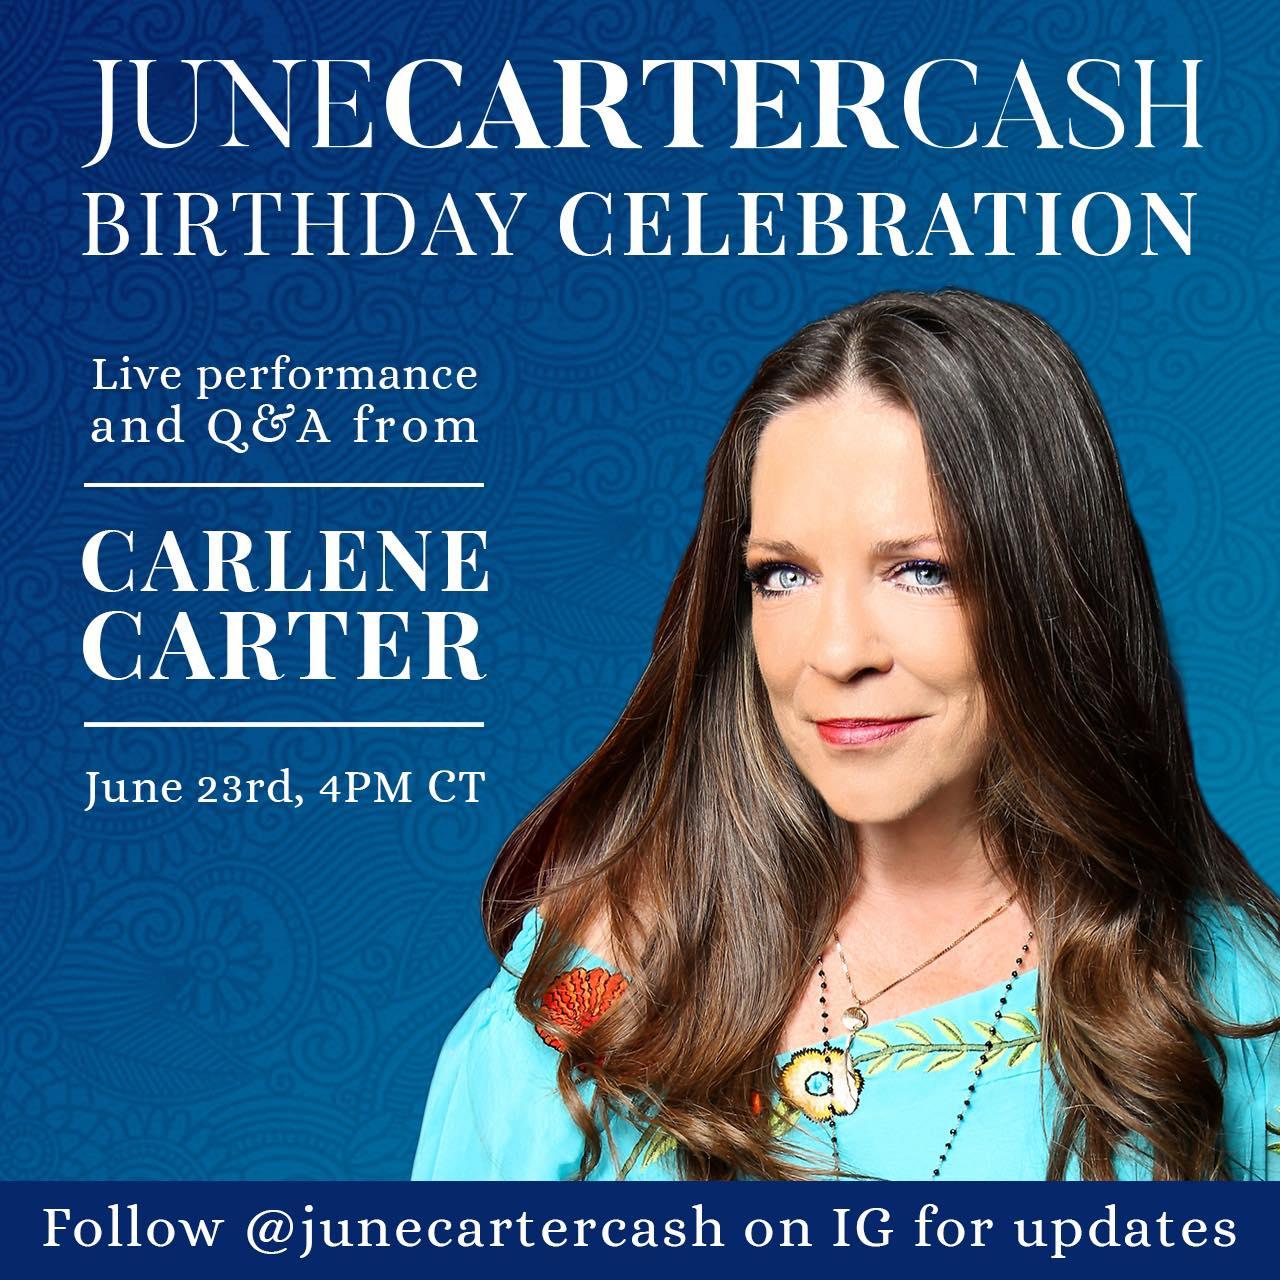 June Carter Cash birthday celebration Instagram livestream with Carlene Carter June 23, 2020